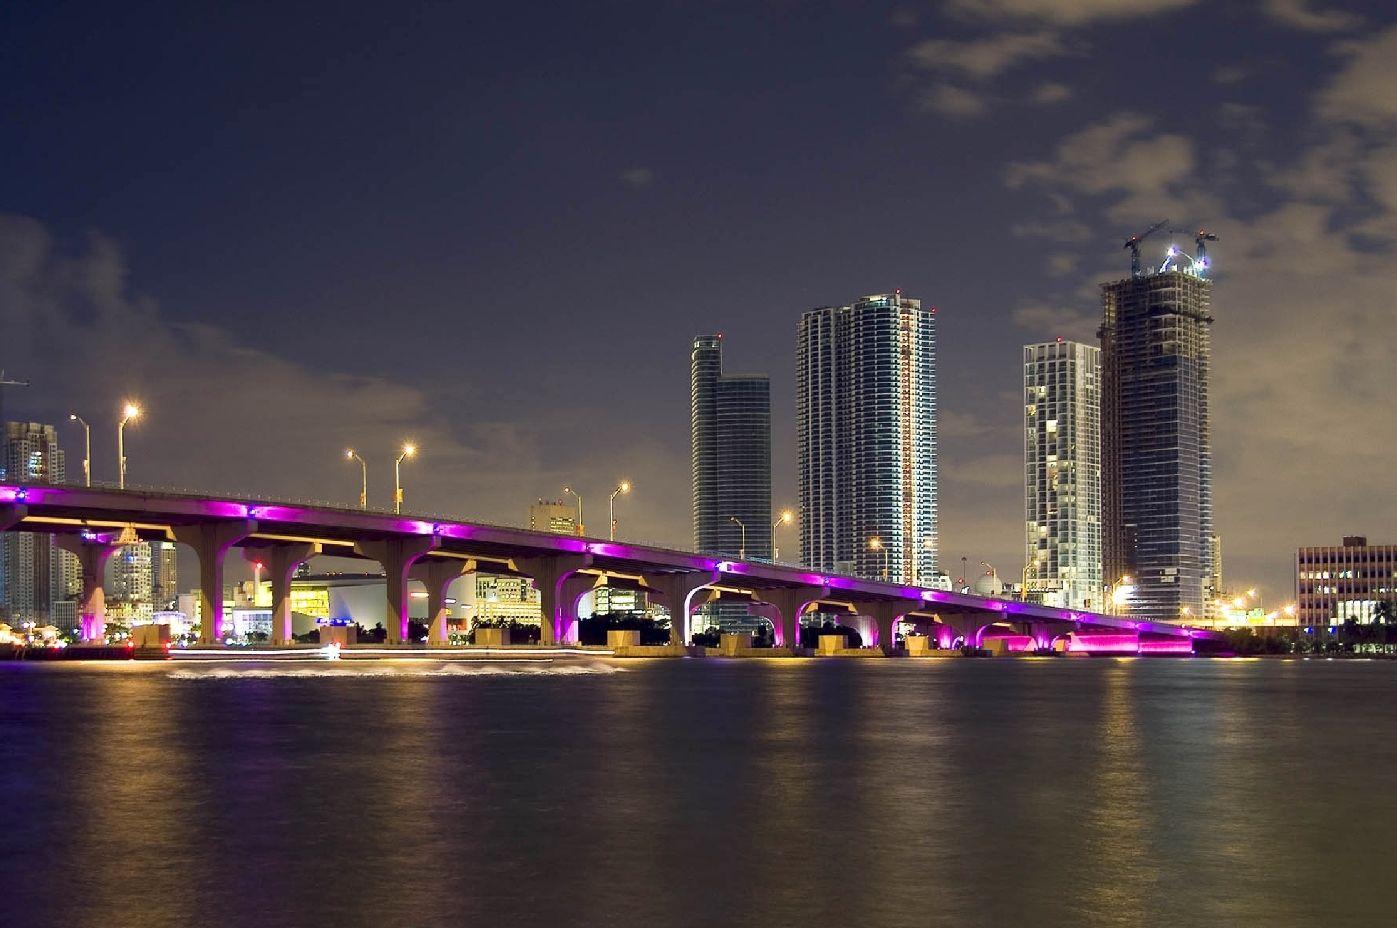 Night Clubs In Melbourne Fl Clique Abaixo Na Marca De Sua Preferencia E Confira Nossas Ofertas Florida Usa Miami Florida Miami